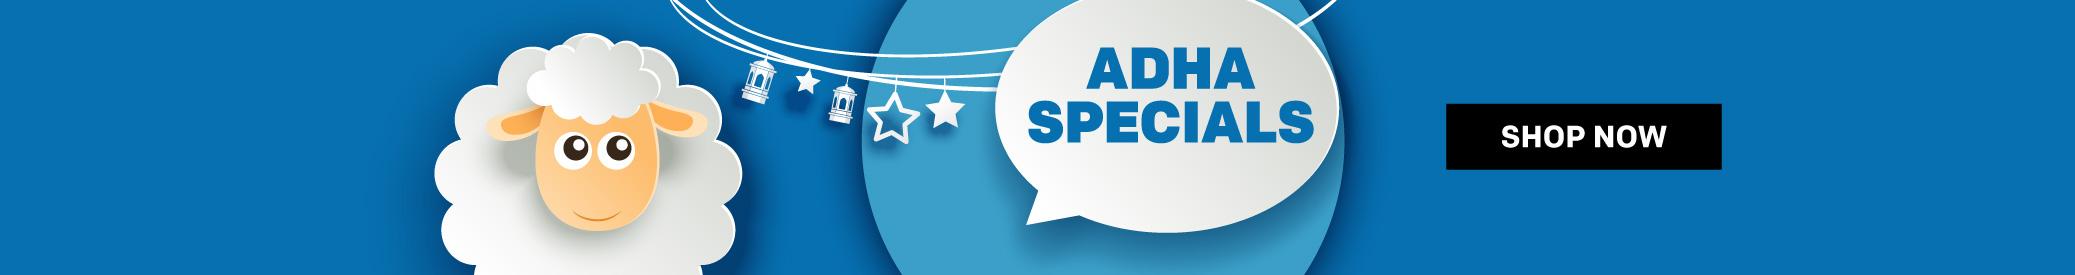 Adha Specials